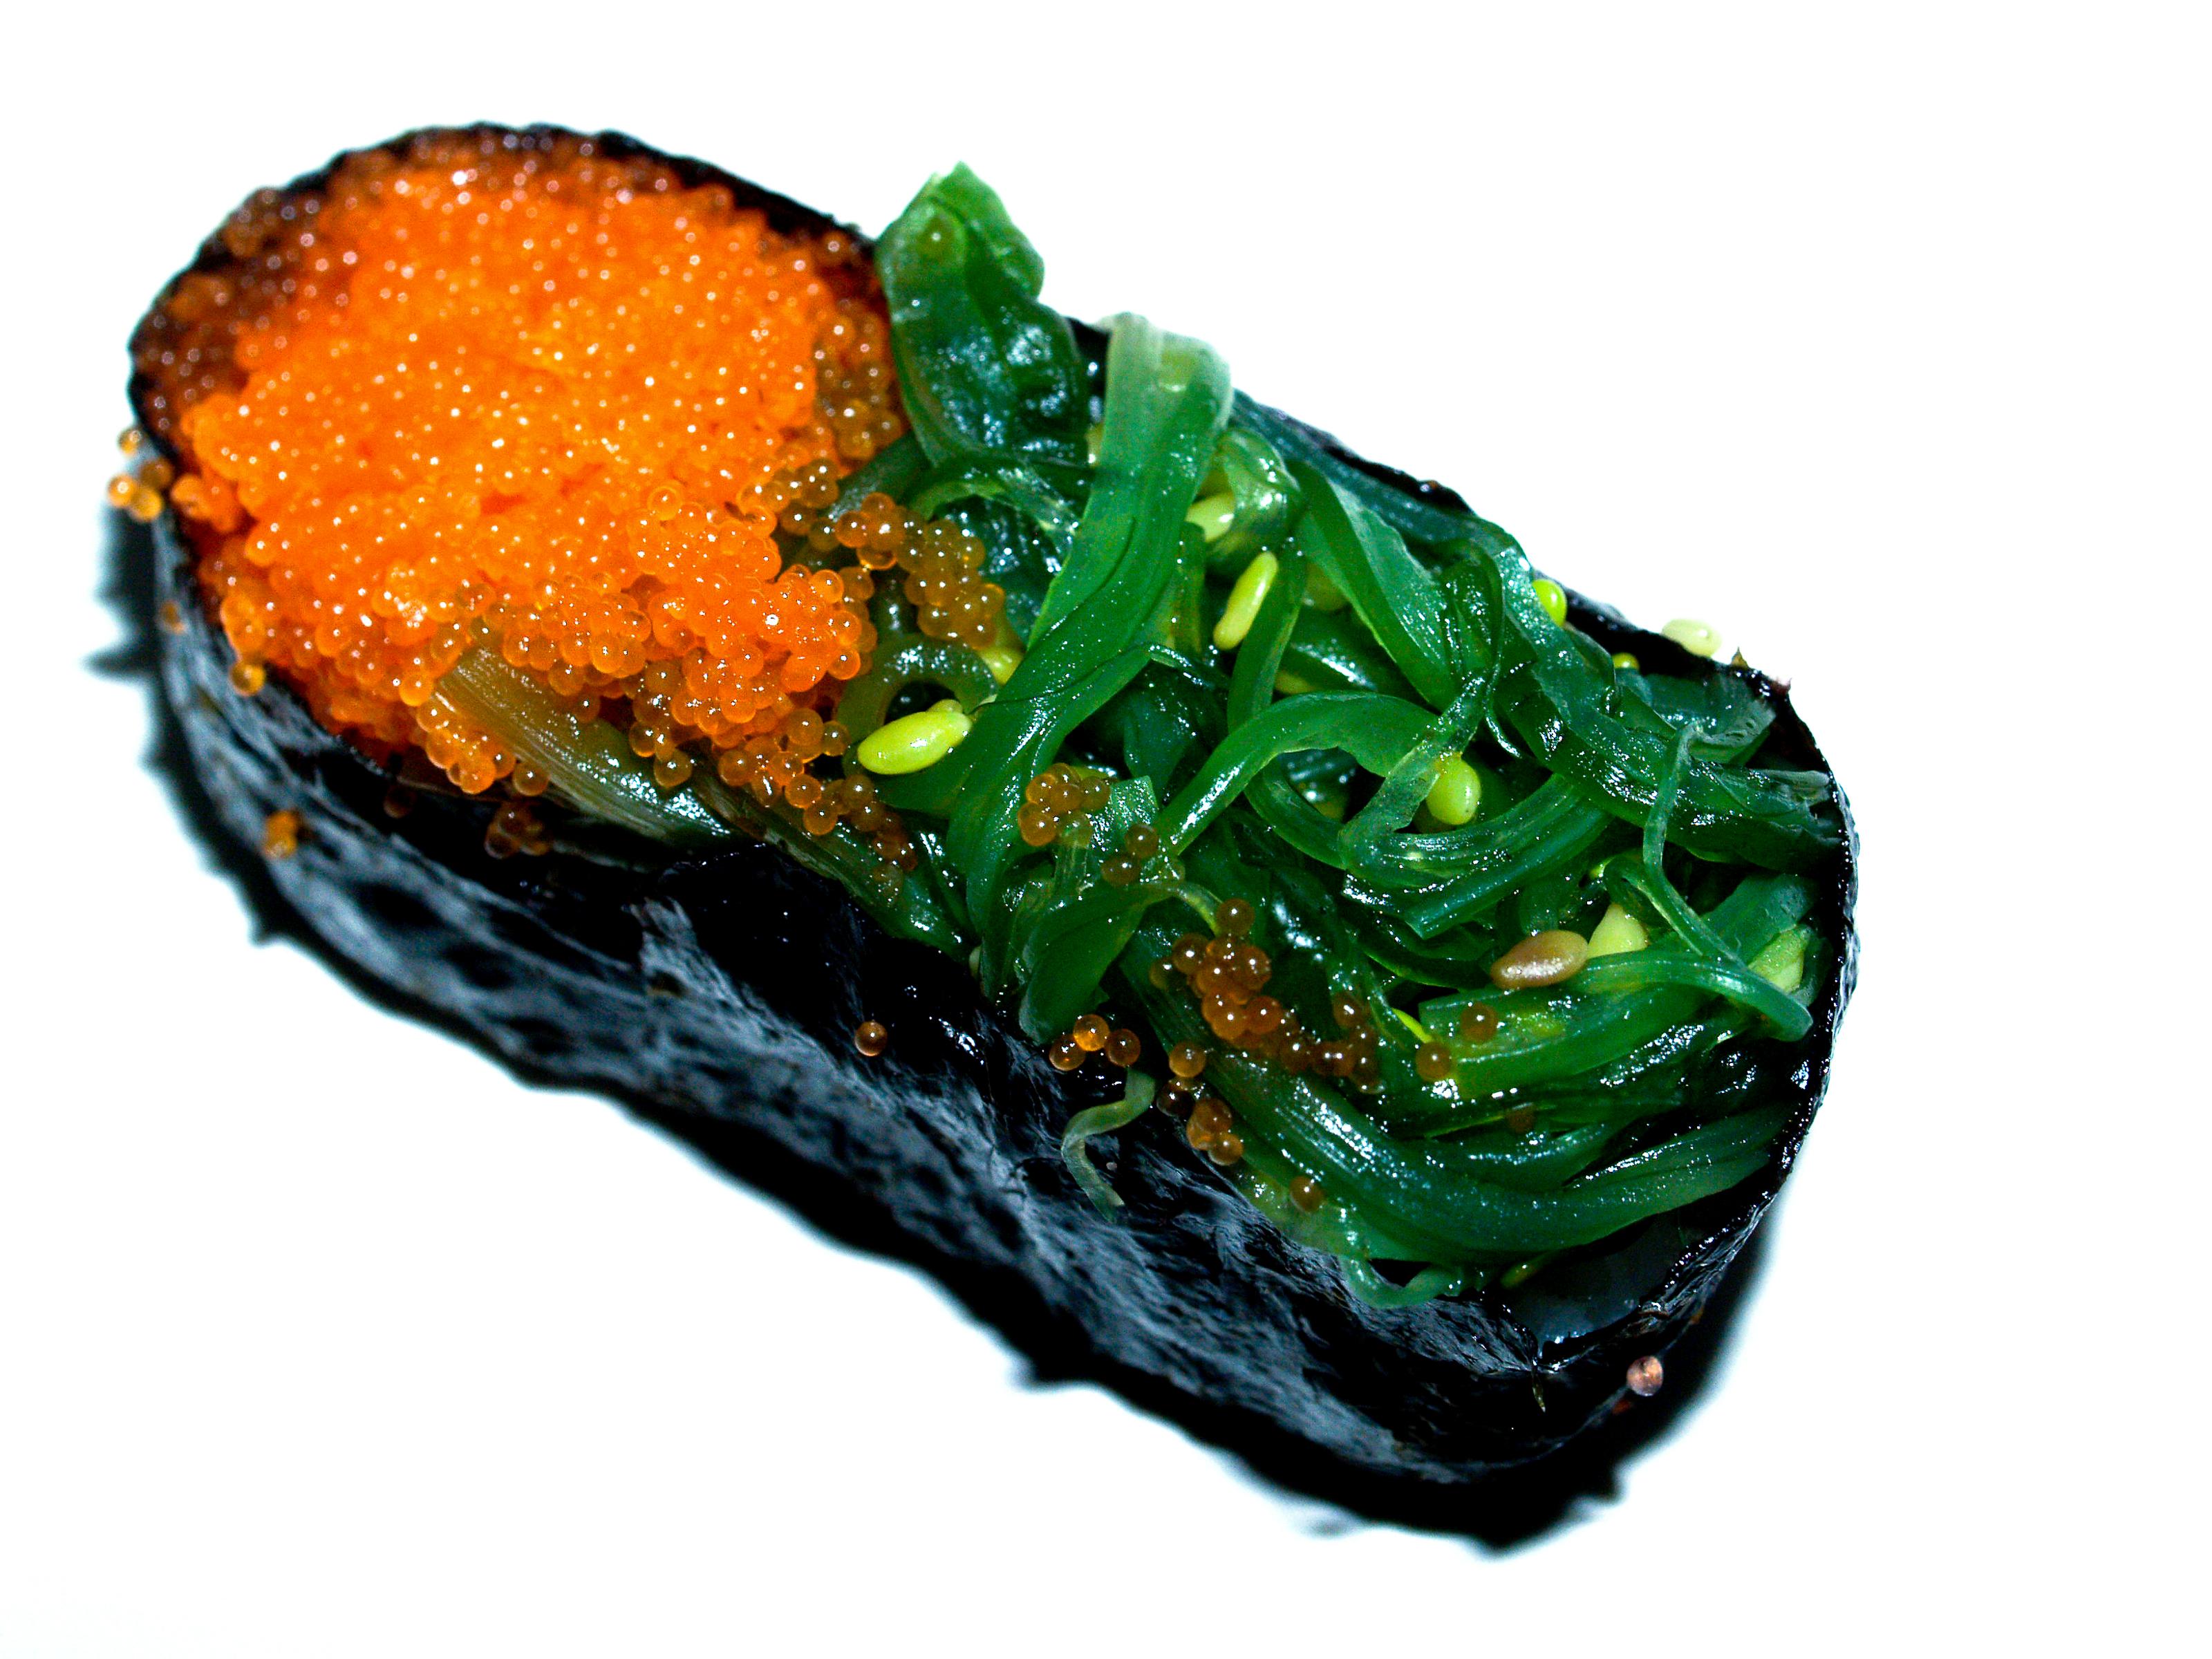 Gambar Jepang Nasi Sushi Tradisional Ikan Salmon Gulungan